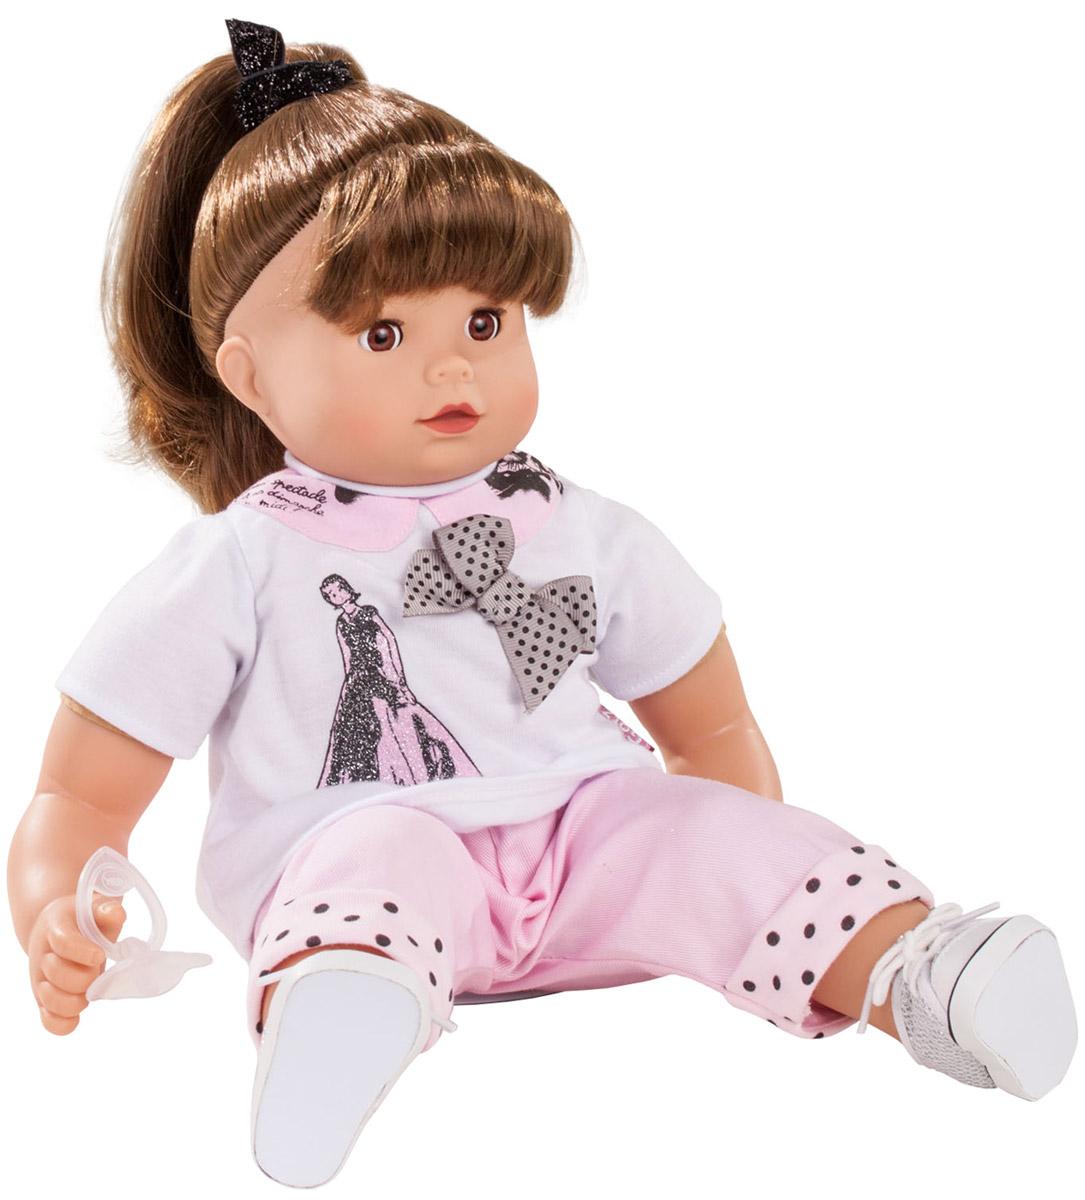 Gotz Кукла Макси Маффин шатенка куклы и одежда для кукол gotz мини маффин 22 см